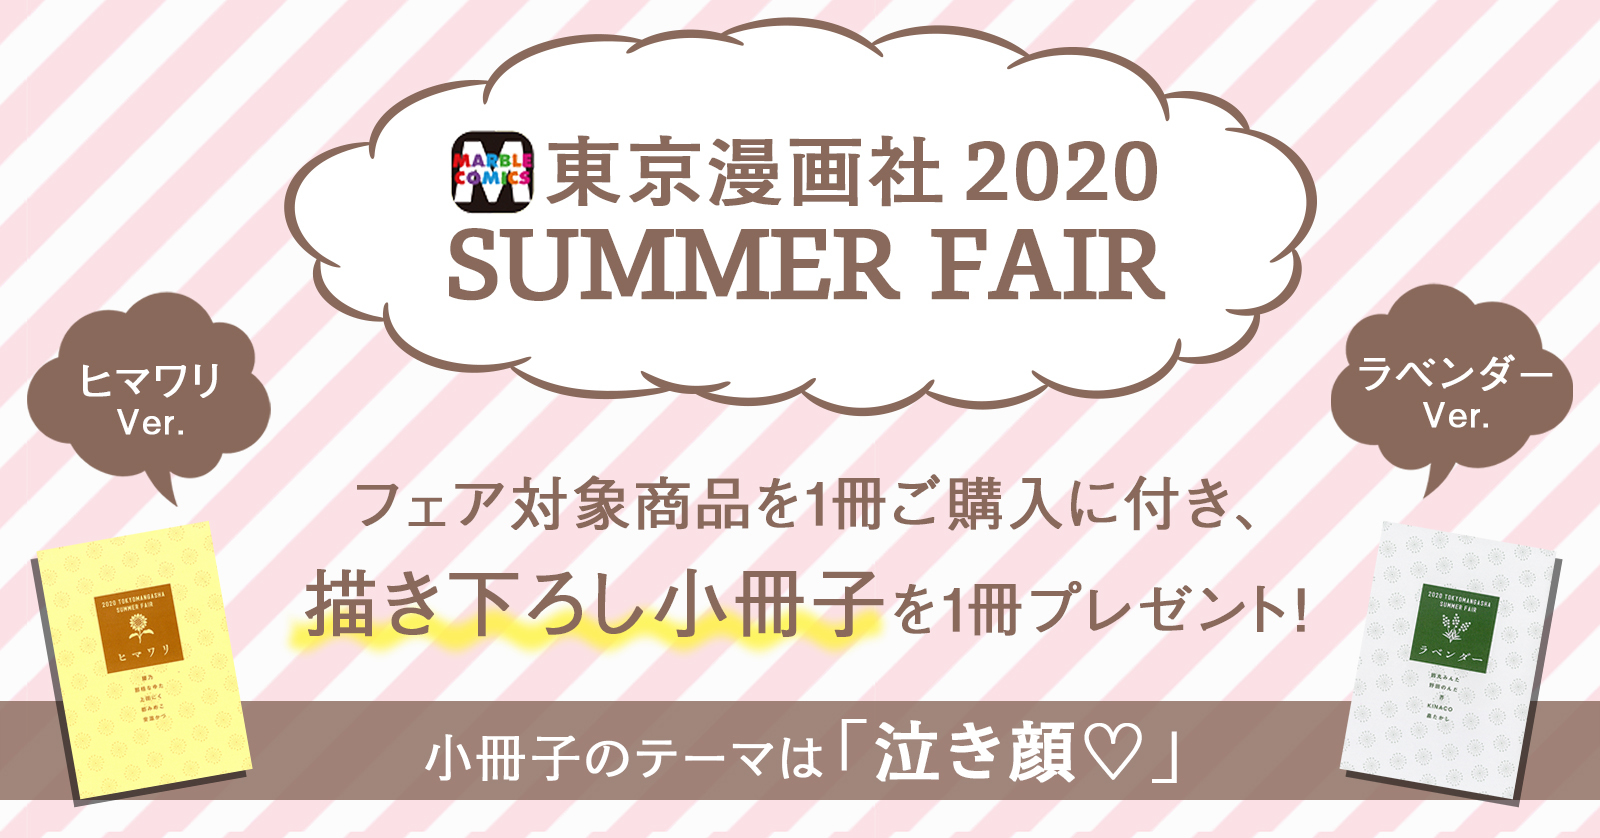 東京漫画社 SUMMER FAIR2020